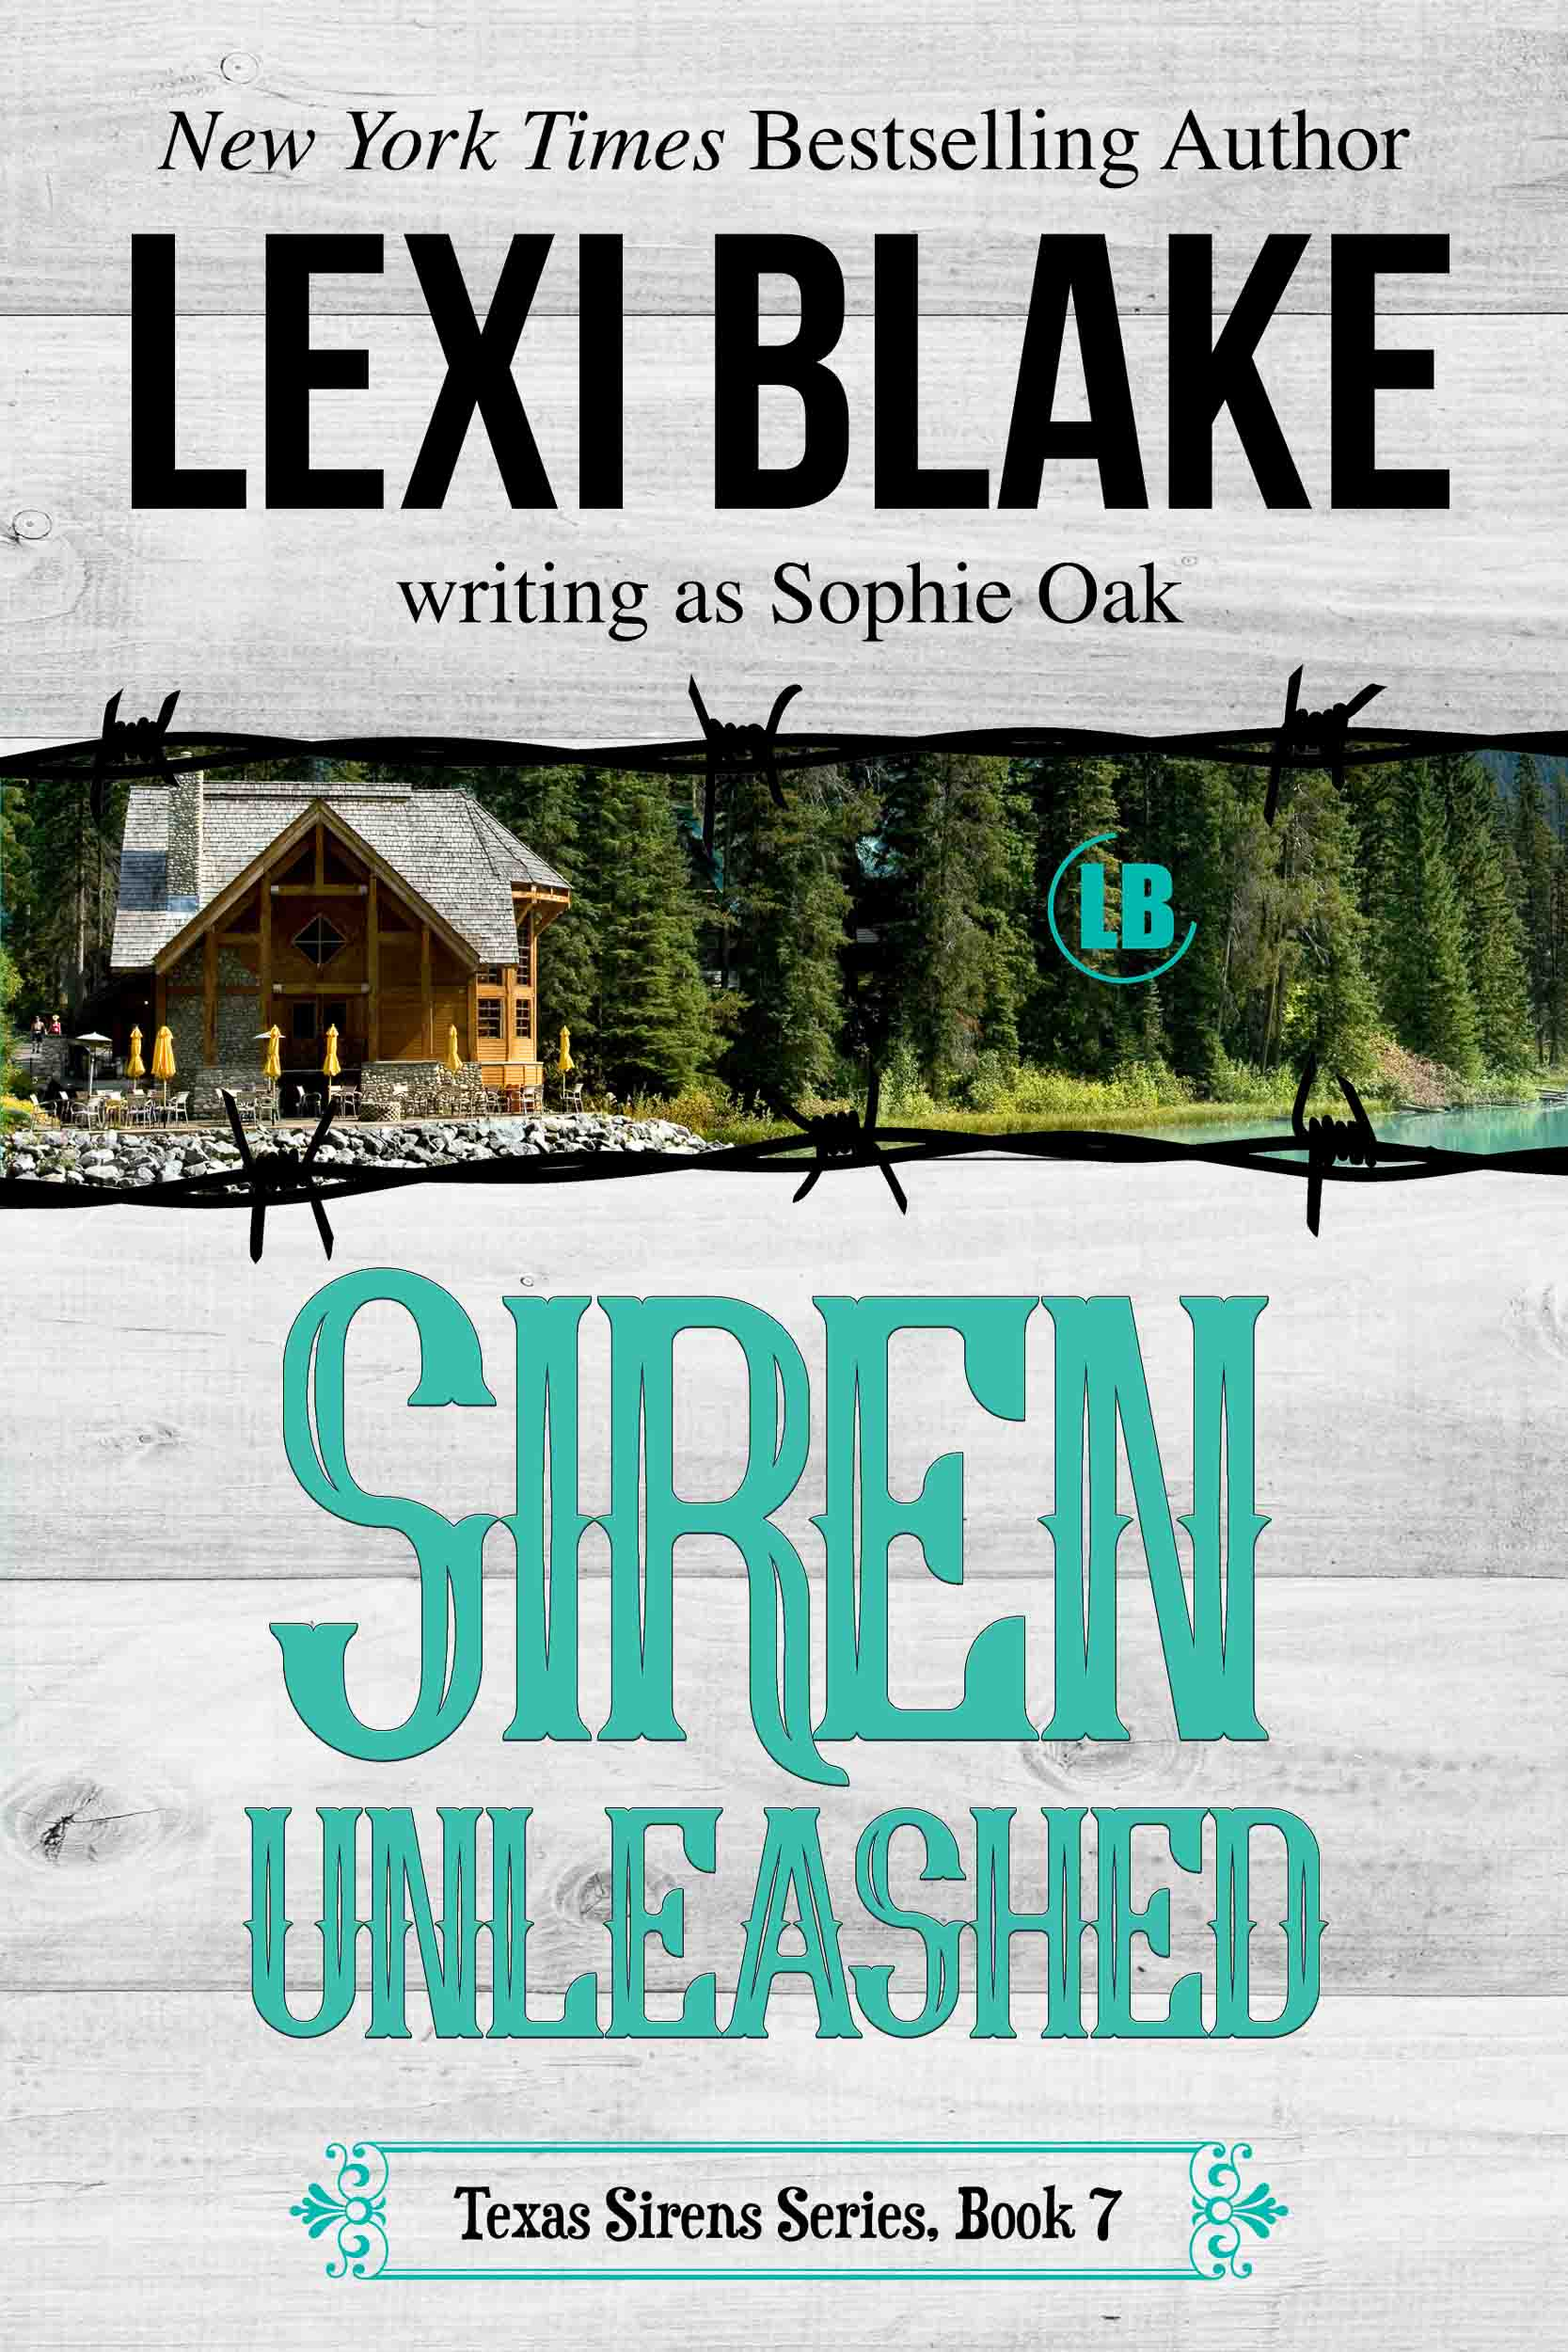 Lexi Blake Siren Unleashed.jpg